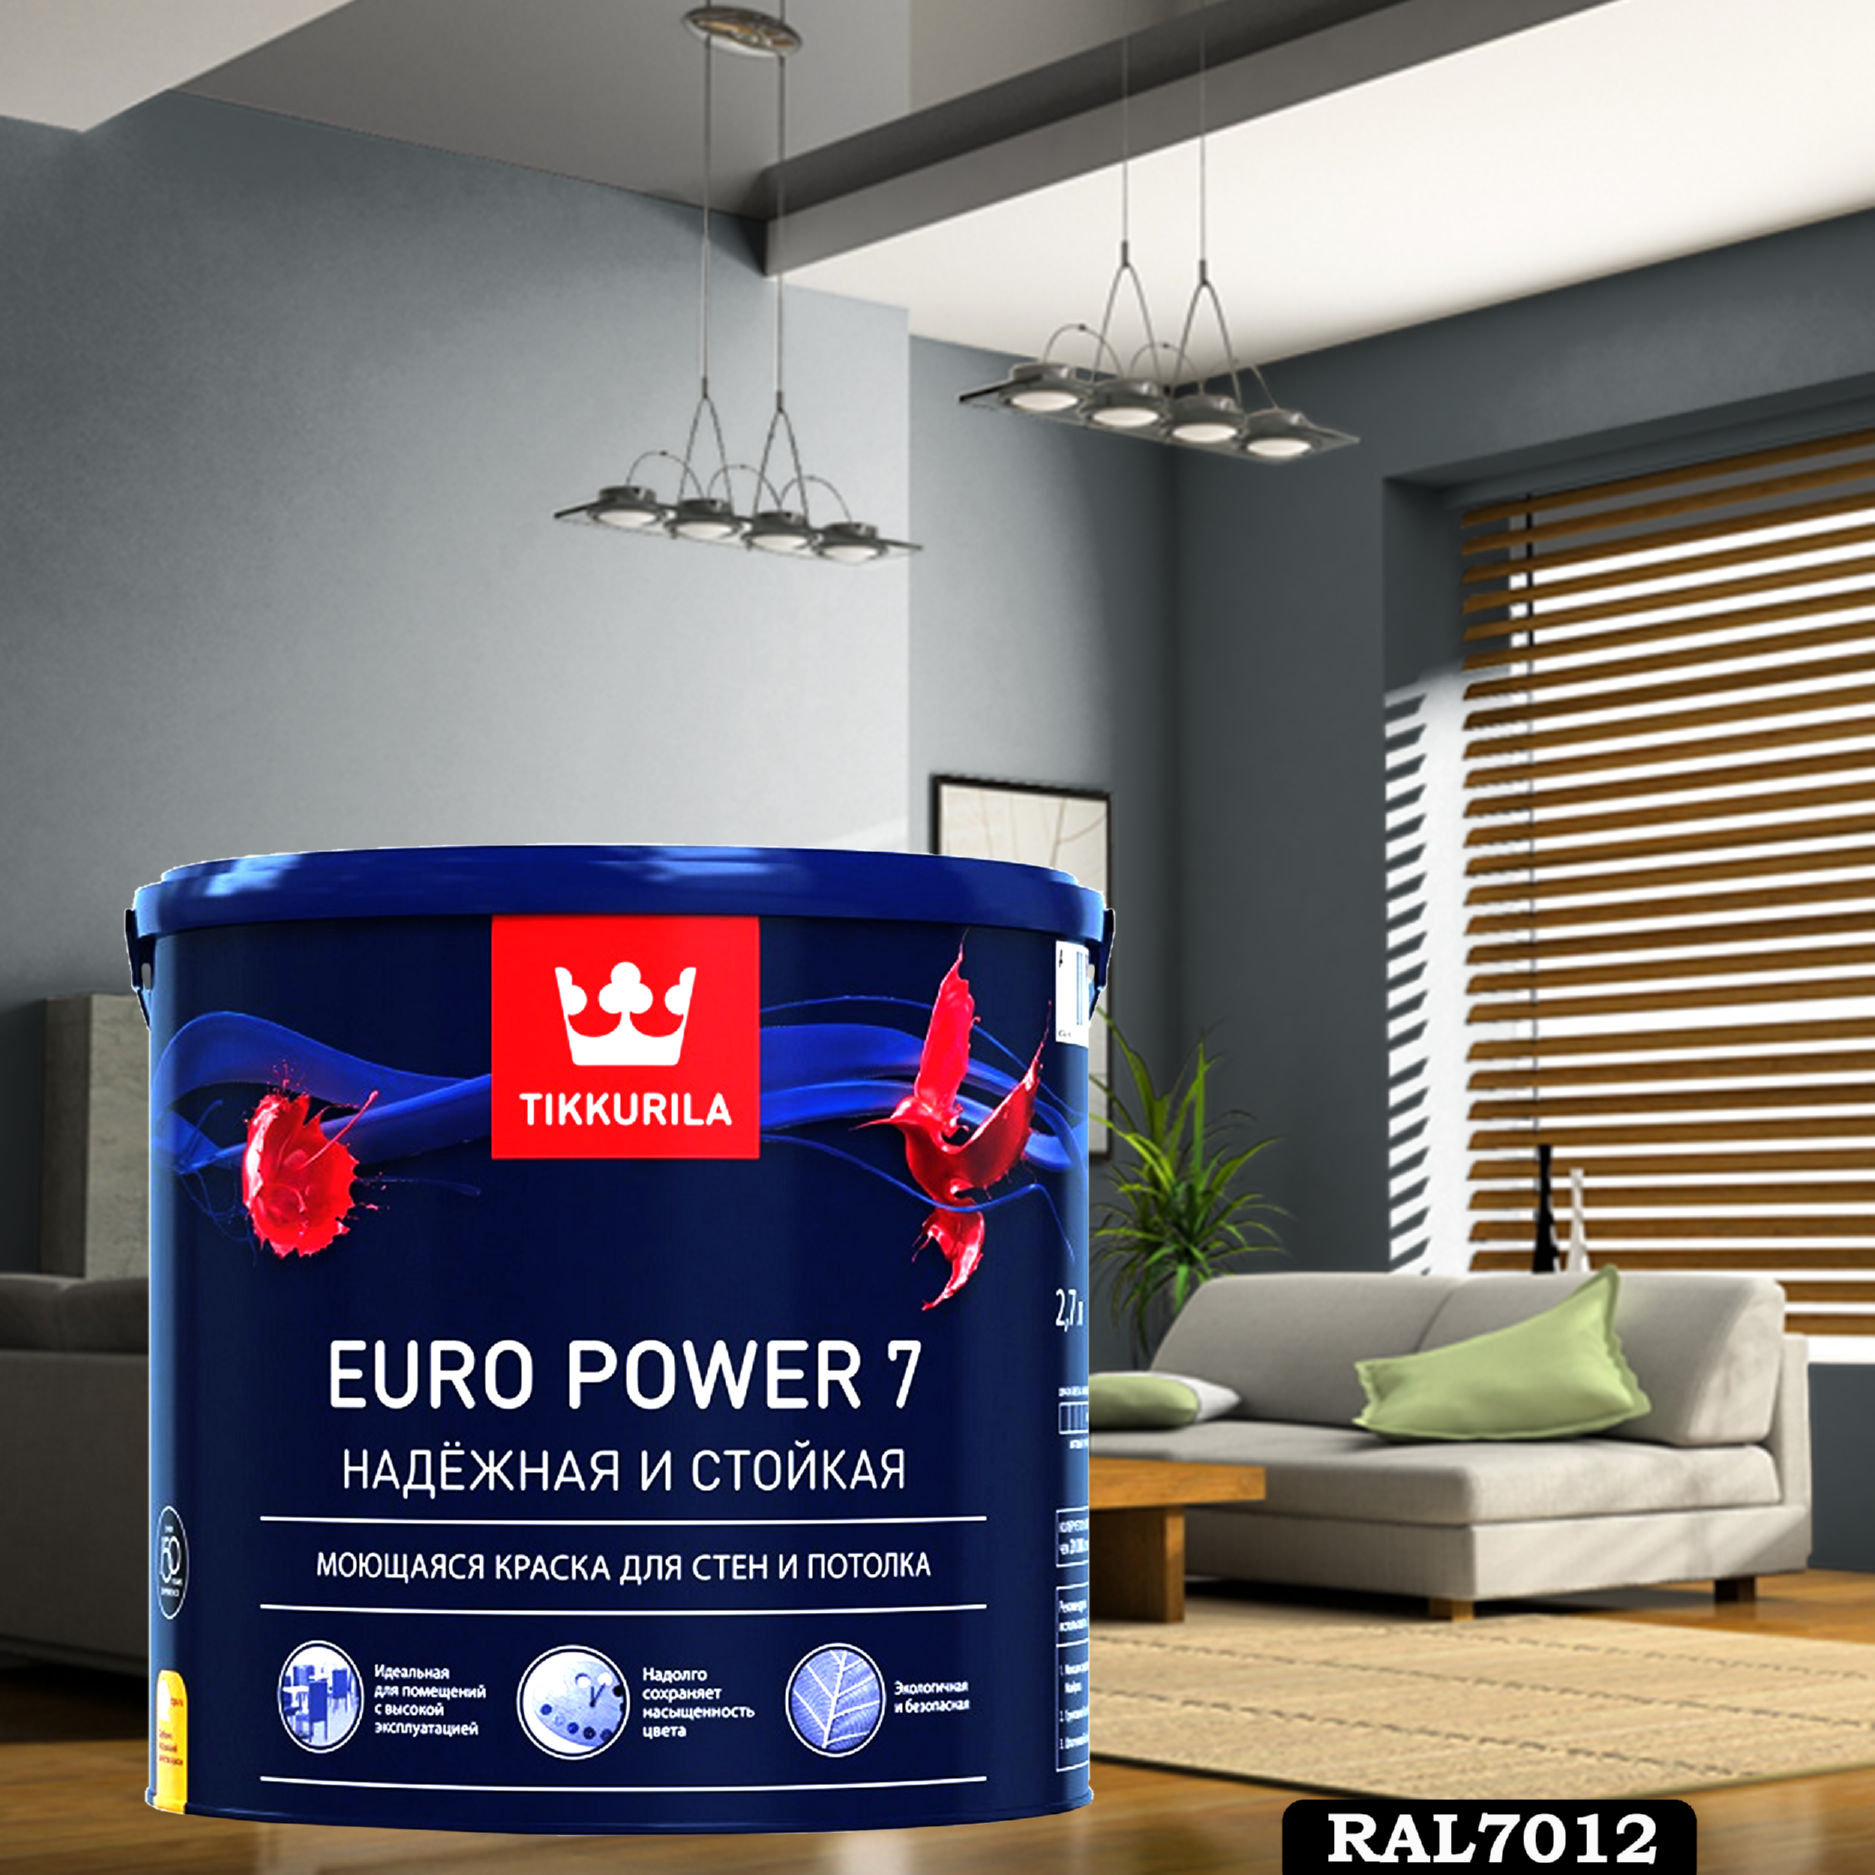 Фото 12 - Краска TIKKURILA Euro Power 7,  RAL 7012 Серый-базальт, латексная моющаяся матовая интерьерная, 9 л.